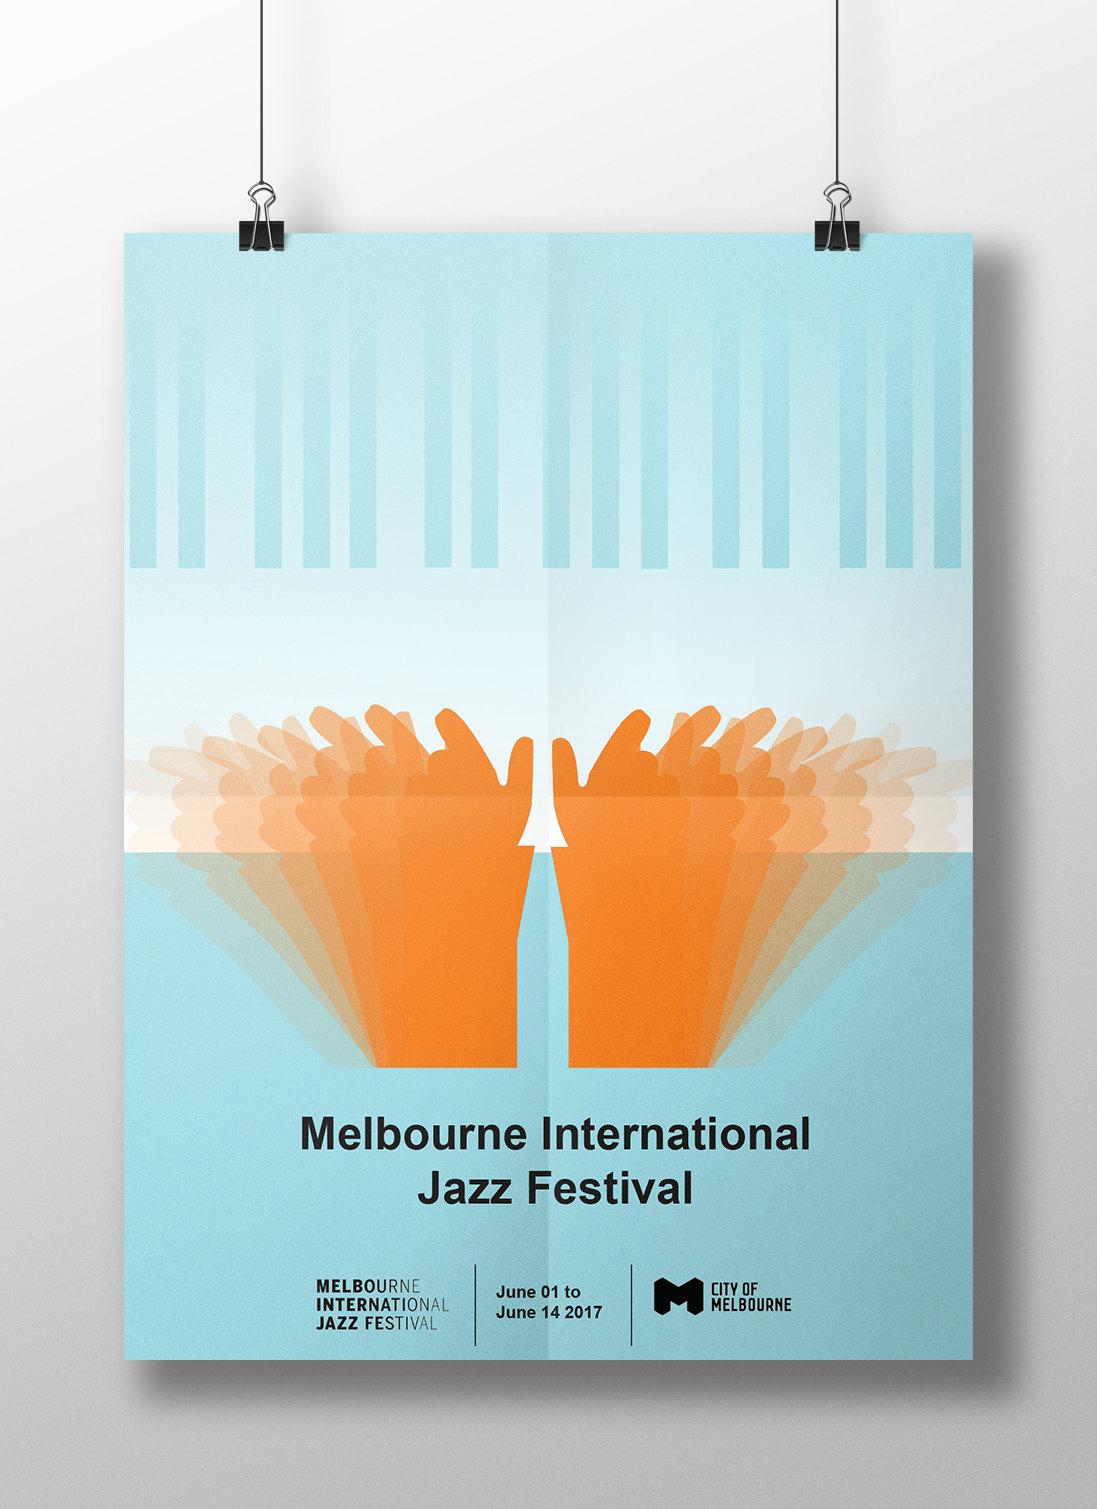 Melbourne International Jazz Festival poster